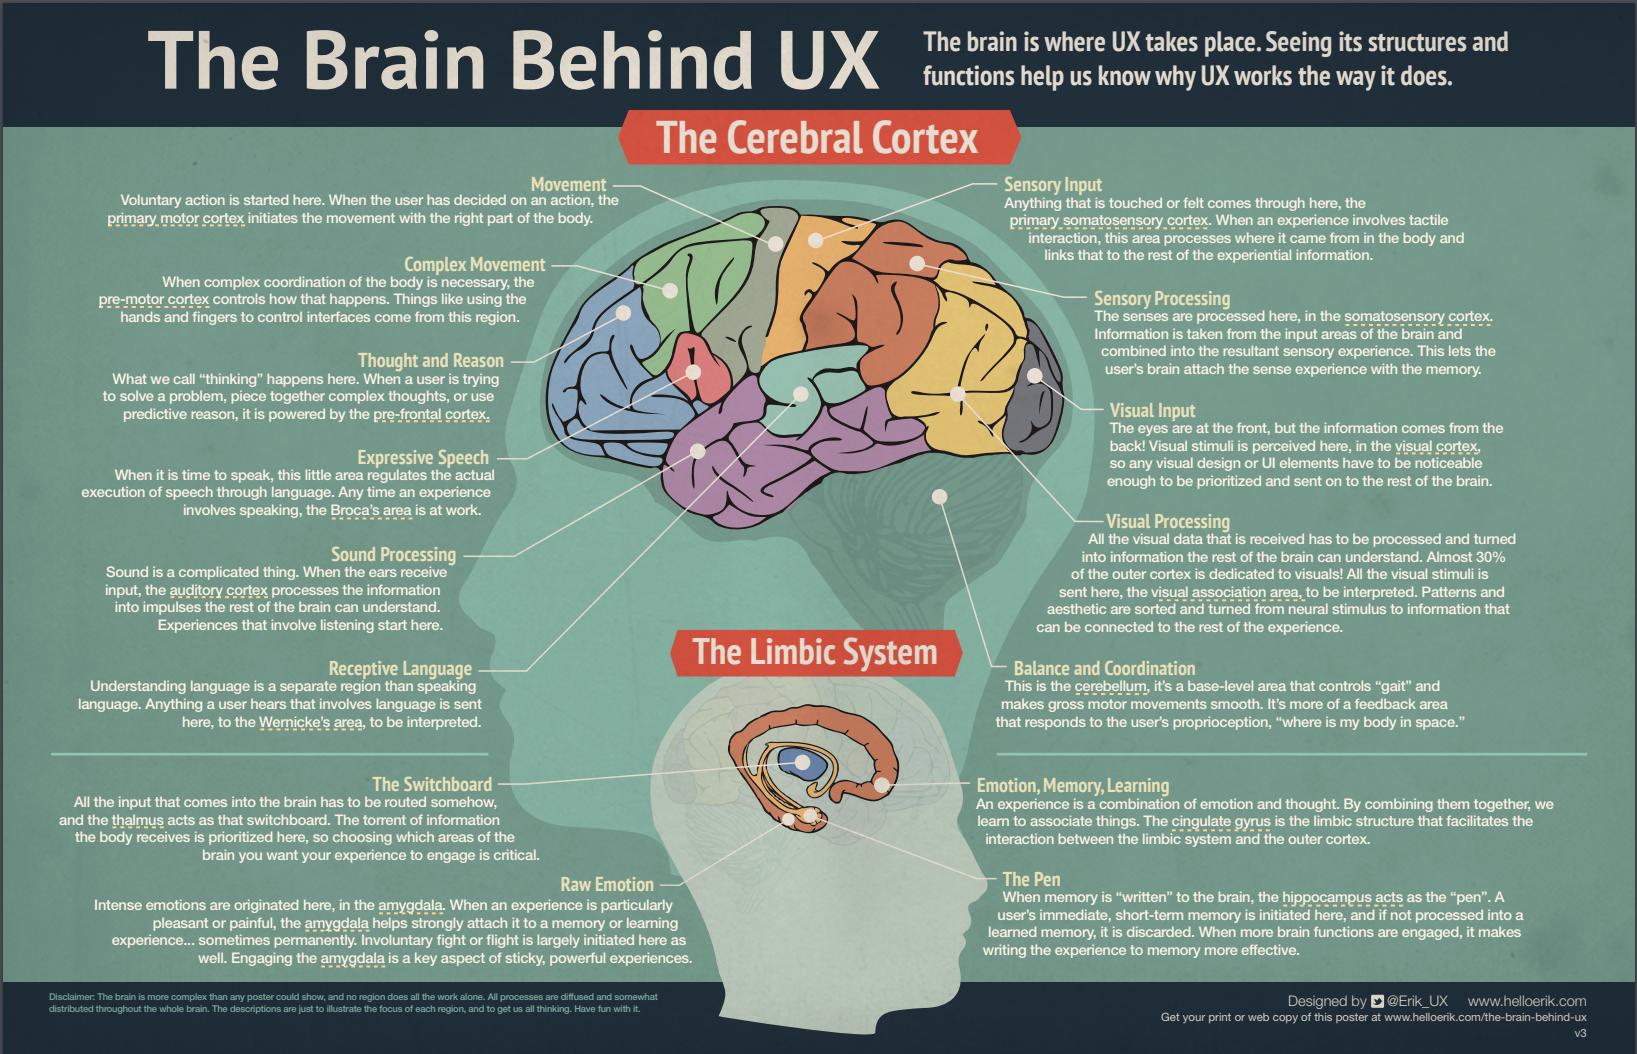 由 Erik Flowers所製作的UX和Psychology的Infographic